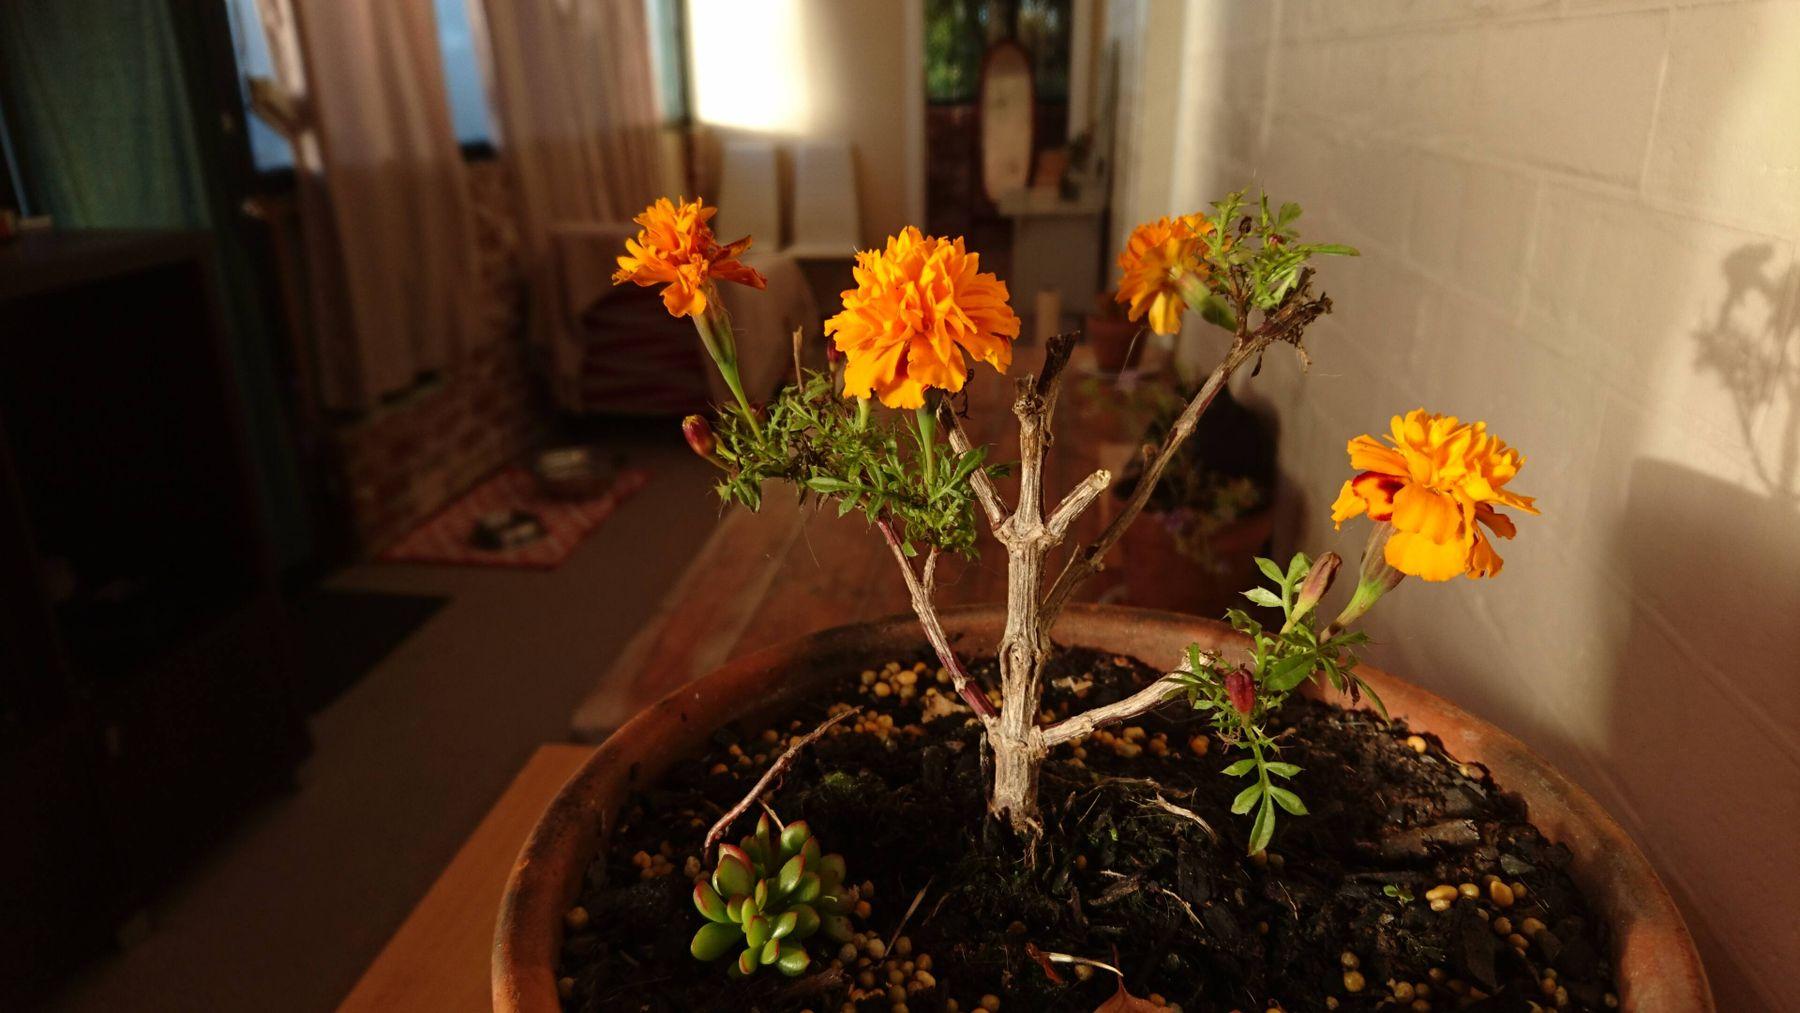 Marigold ornamental plant